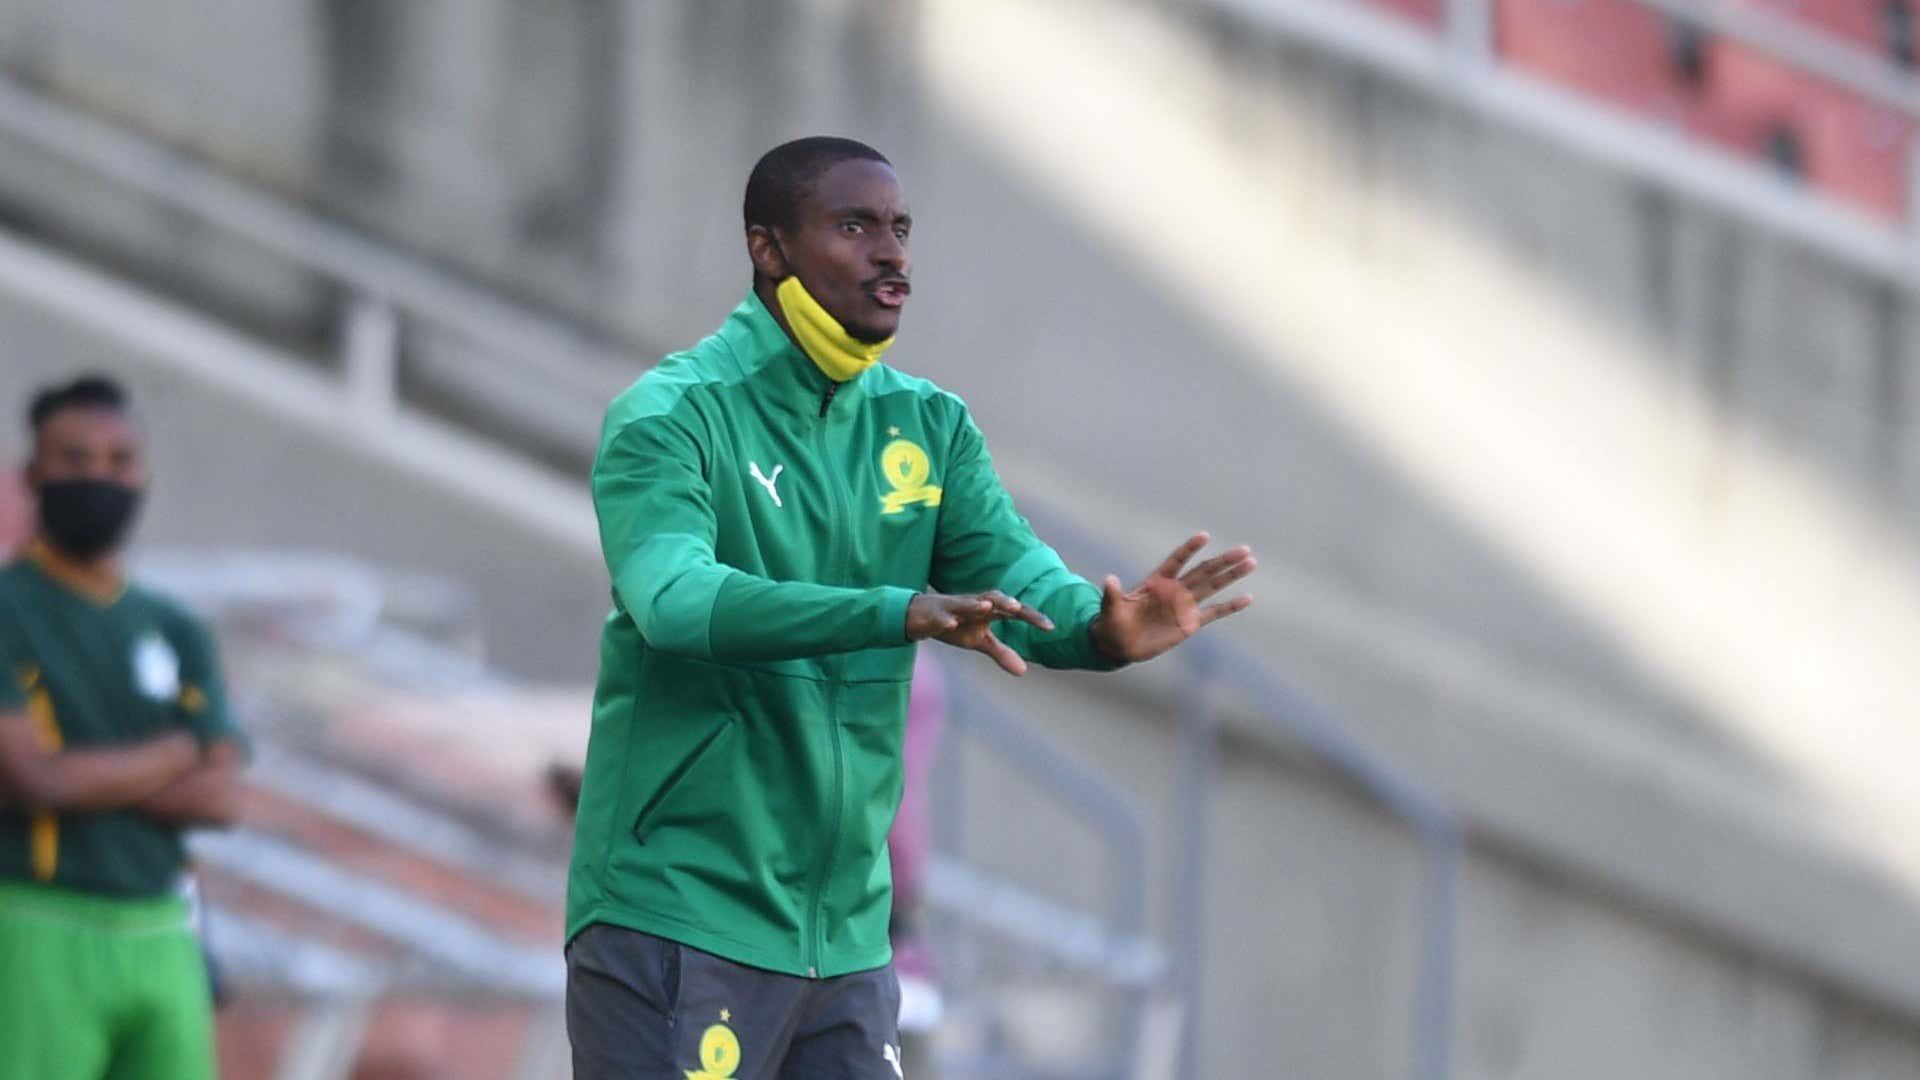 Mamelodi Sundowns' Mokwena reveals Caf Champions League target